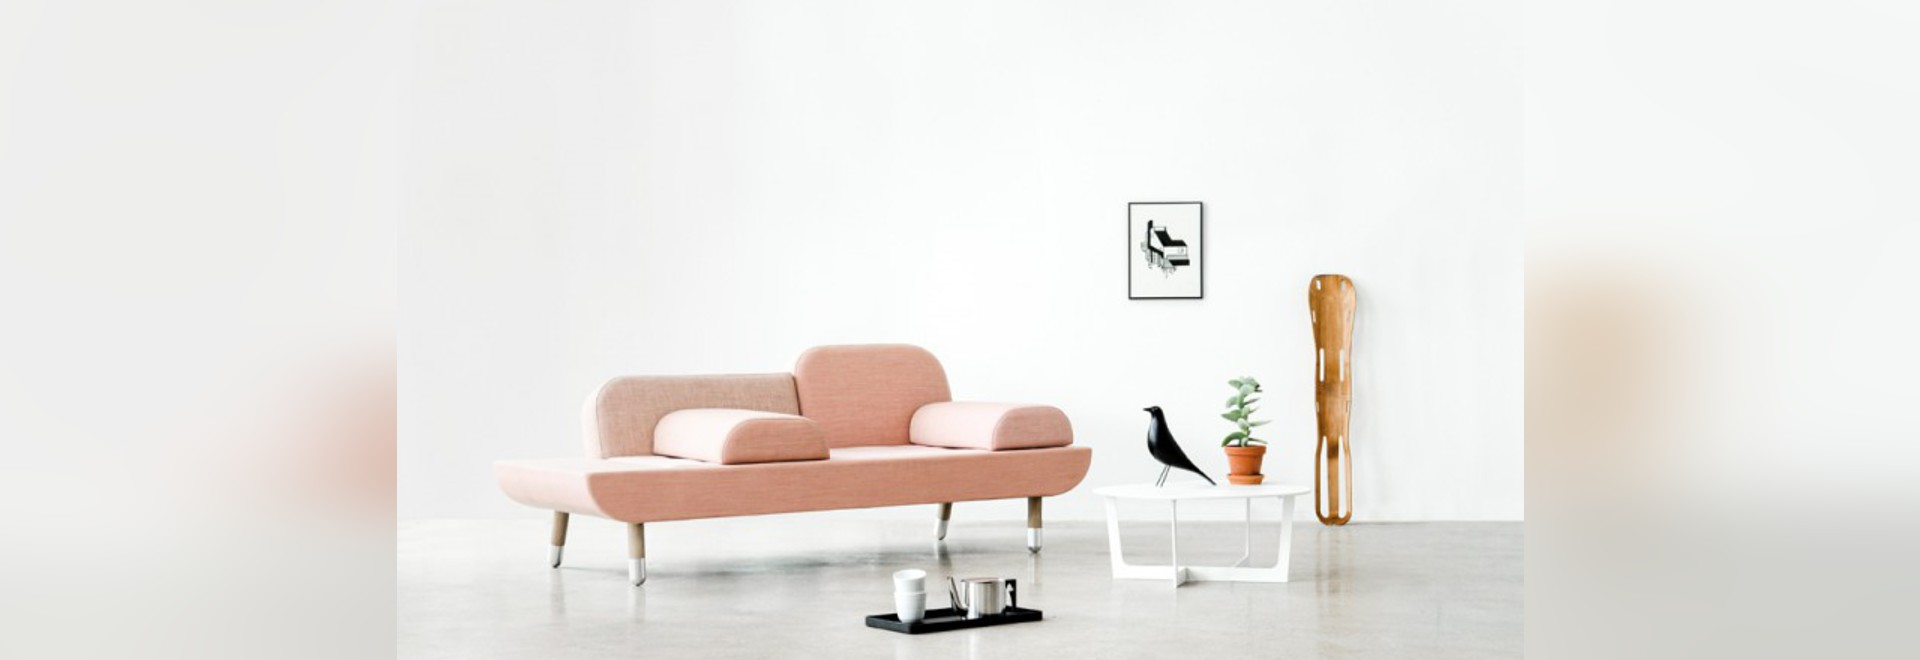 ANNE BOYSEN'S DARING DESIGNS BALANCE FUNCTION AND CREATIVITY